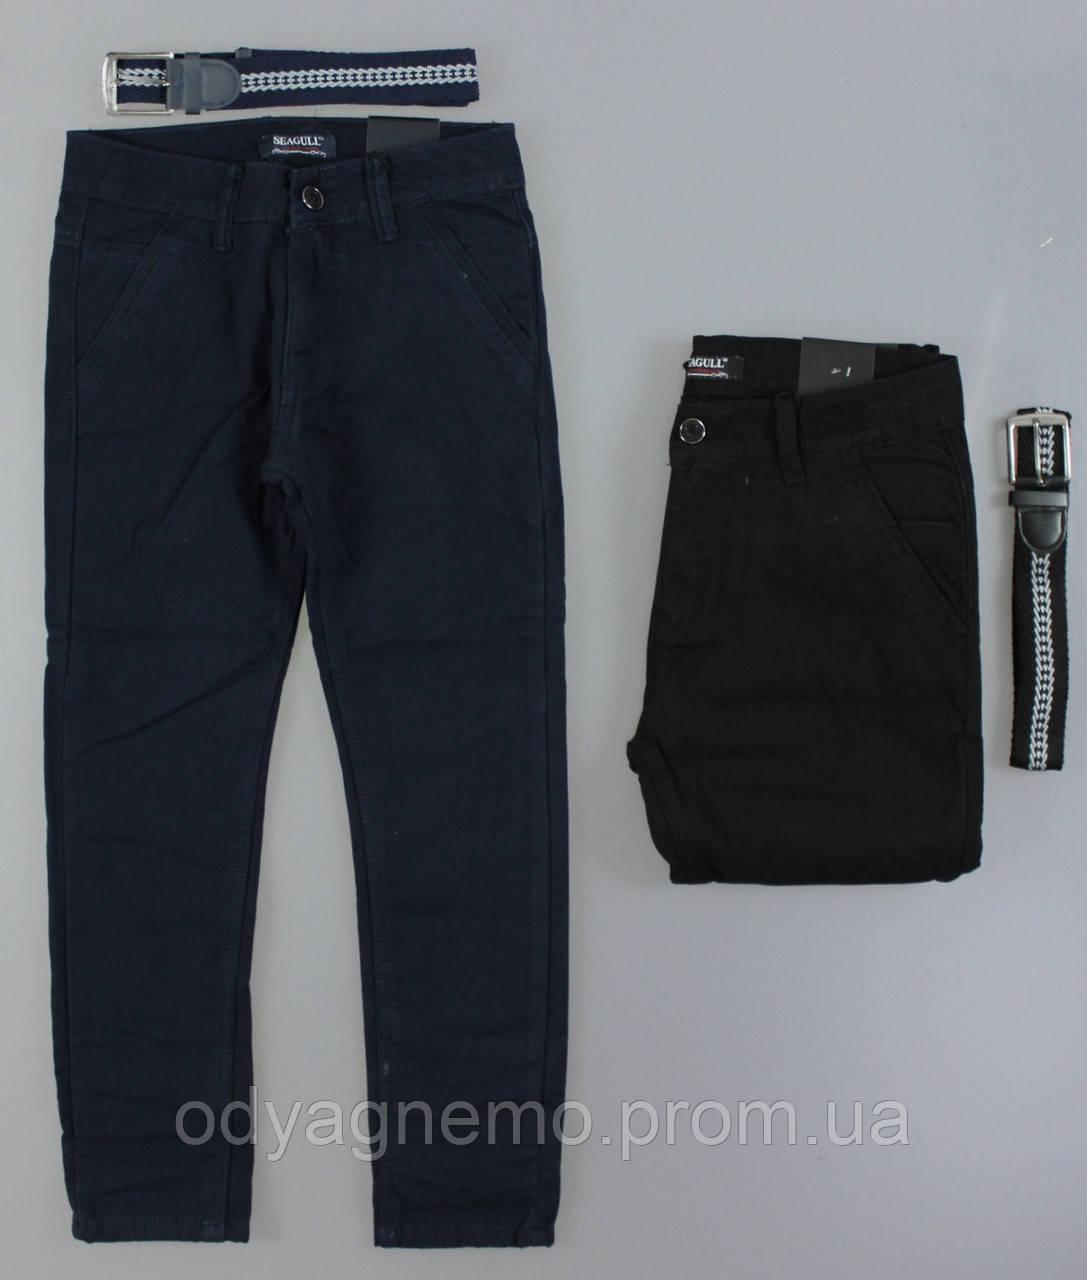 Котоновые брюки на флисе для мальчиков Seagull ,134-164 рр. Артикул: CSQ89935